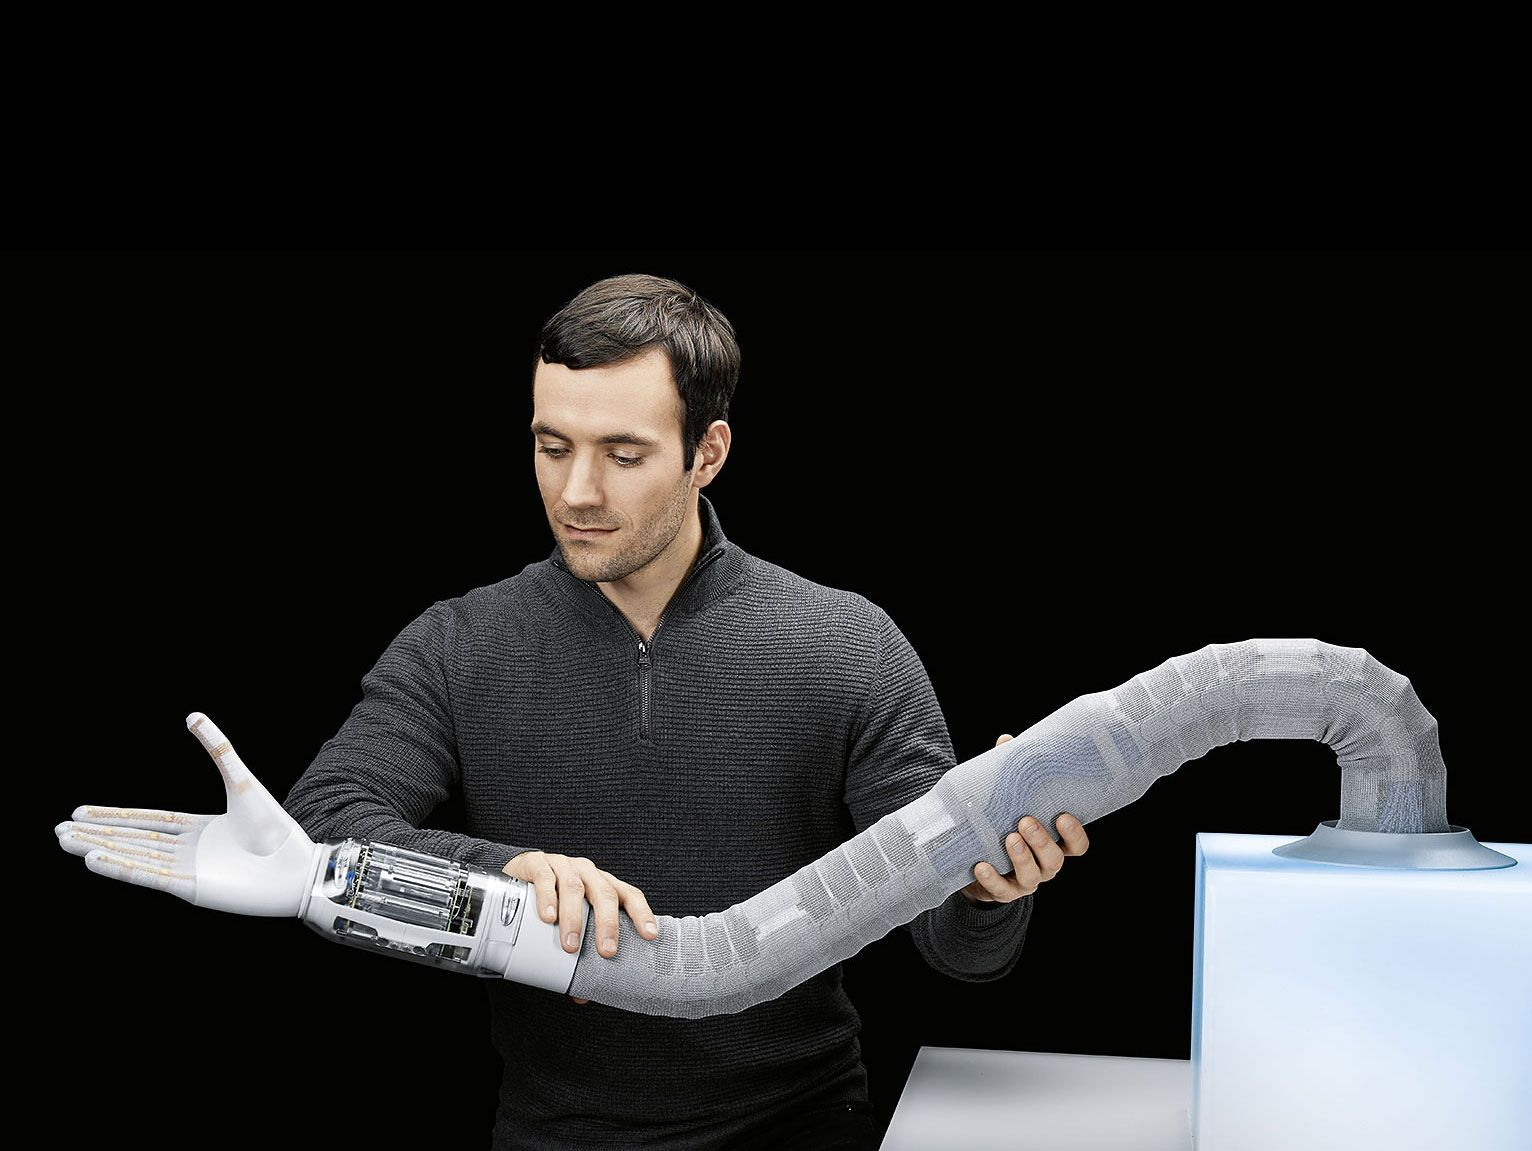 Festo BionicSoftArm